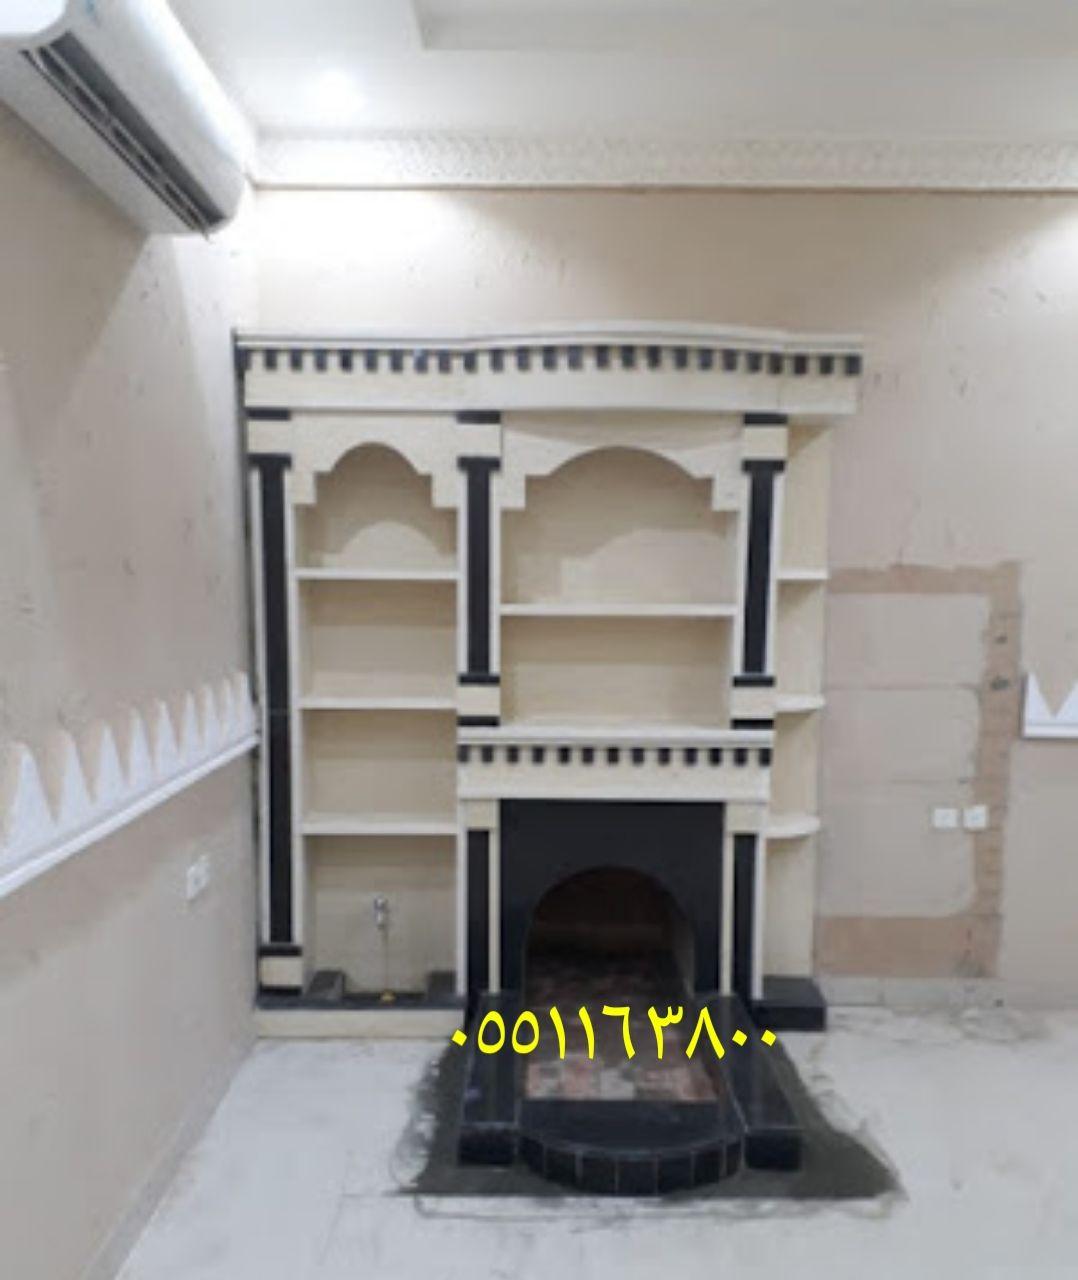 Pin By Mashabat On مشبات صورمشبات رخام وحجر صورمشبات نار صوره مشب Home Decor Fireplace Decor